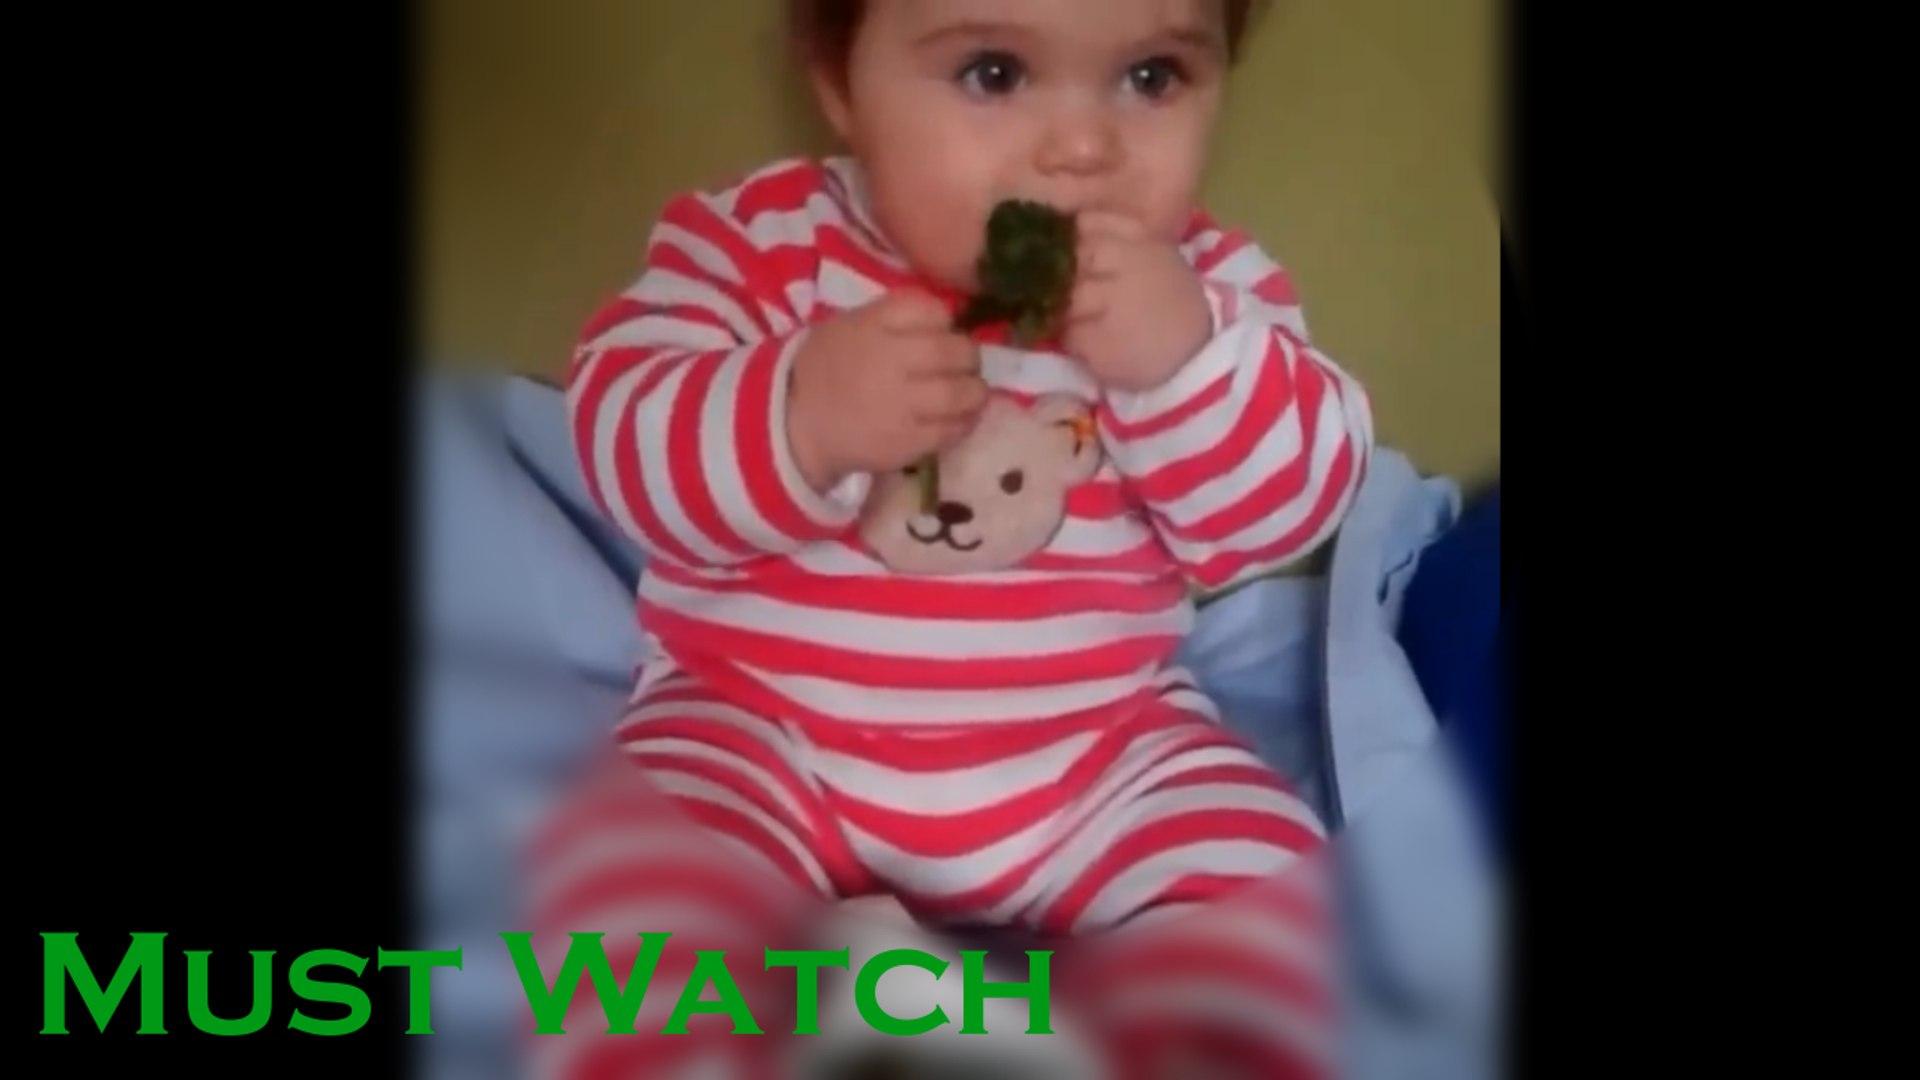 Funny Baby Videos - Cute Baby Eating Broccoli - Cute Baby Videos